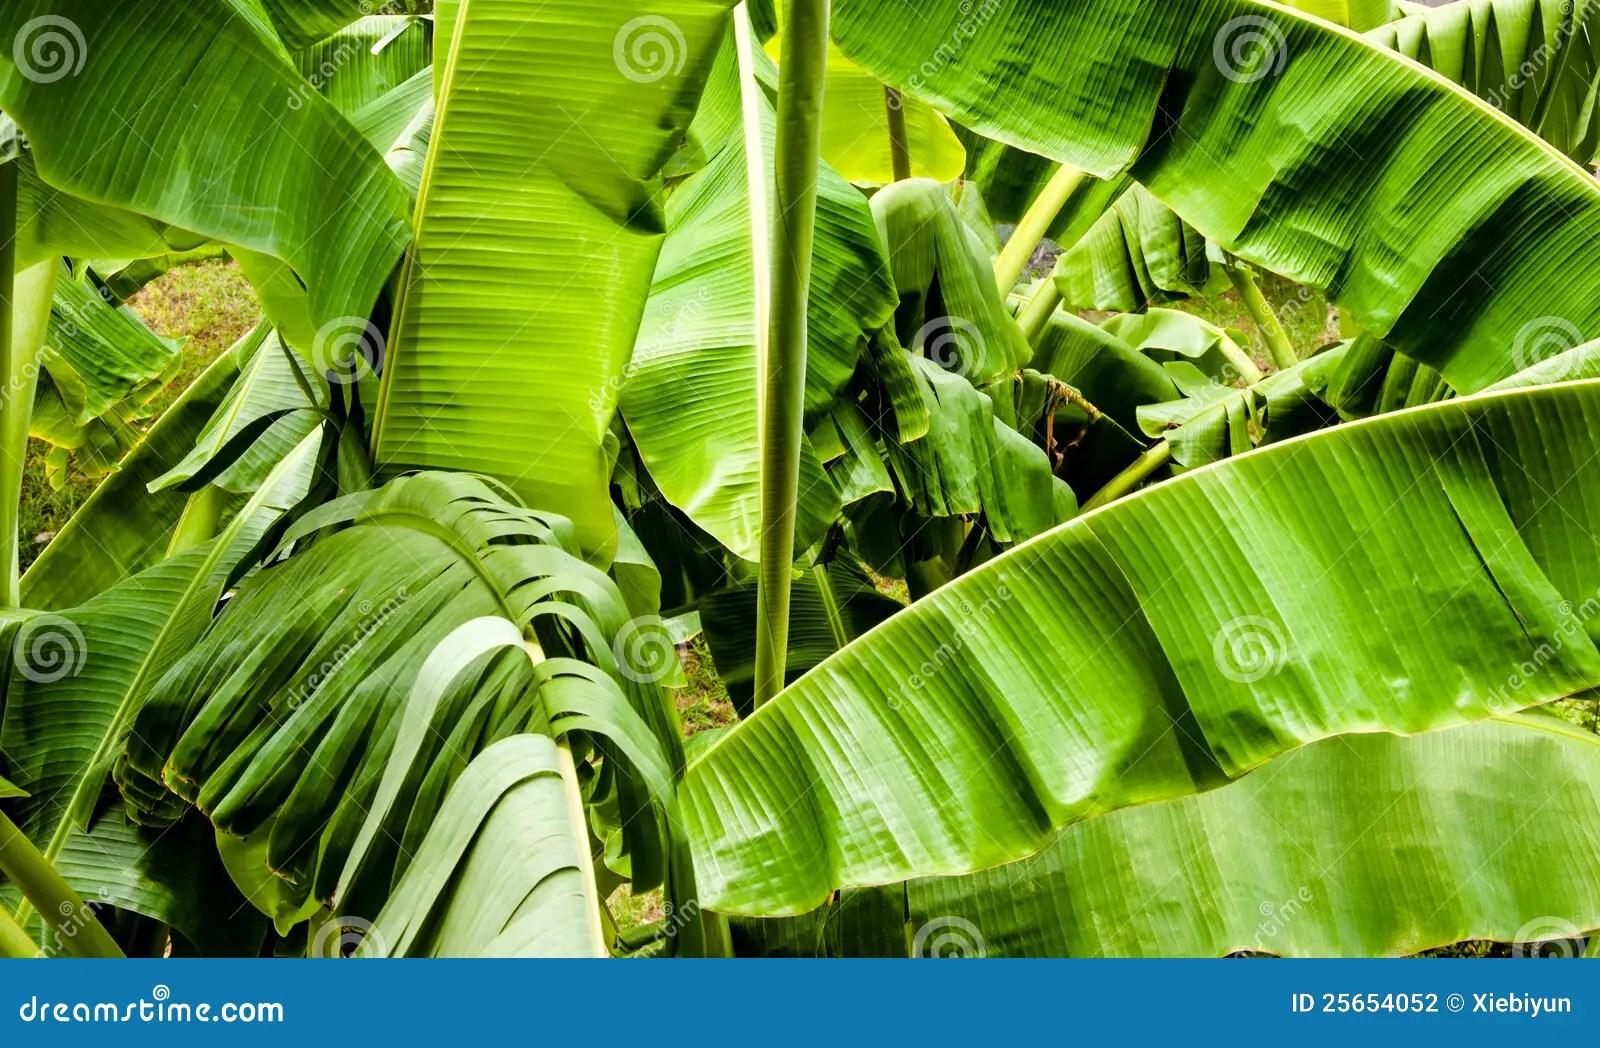 Free Fall Season Wallpaper Banana Tree Leaves Stock Photo Image Of Crop Botanical